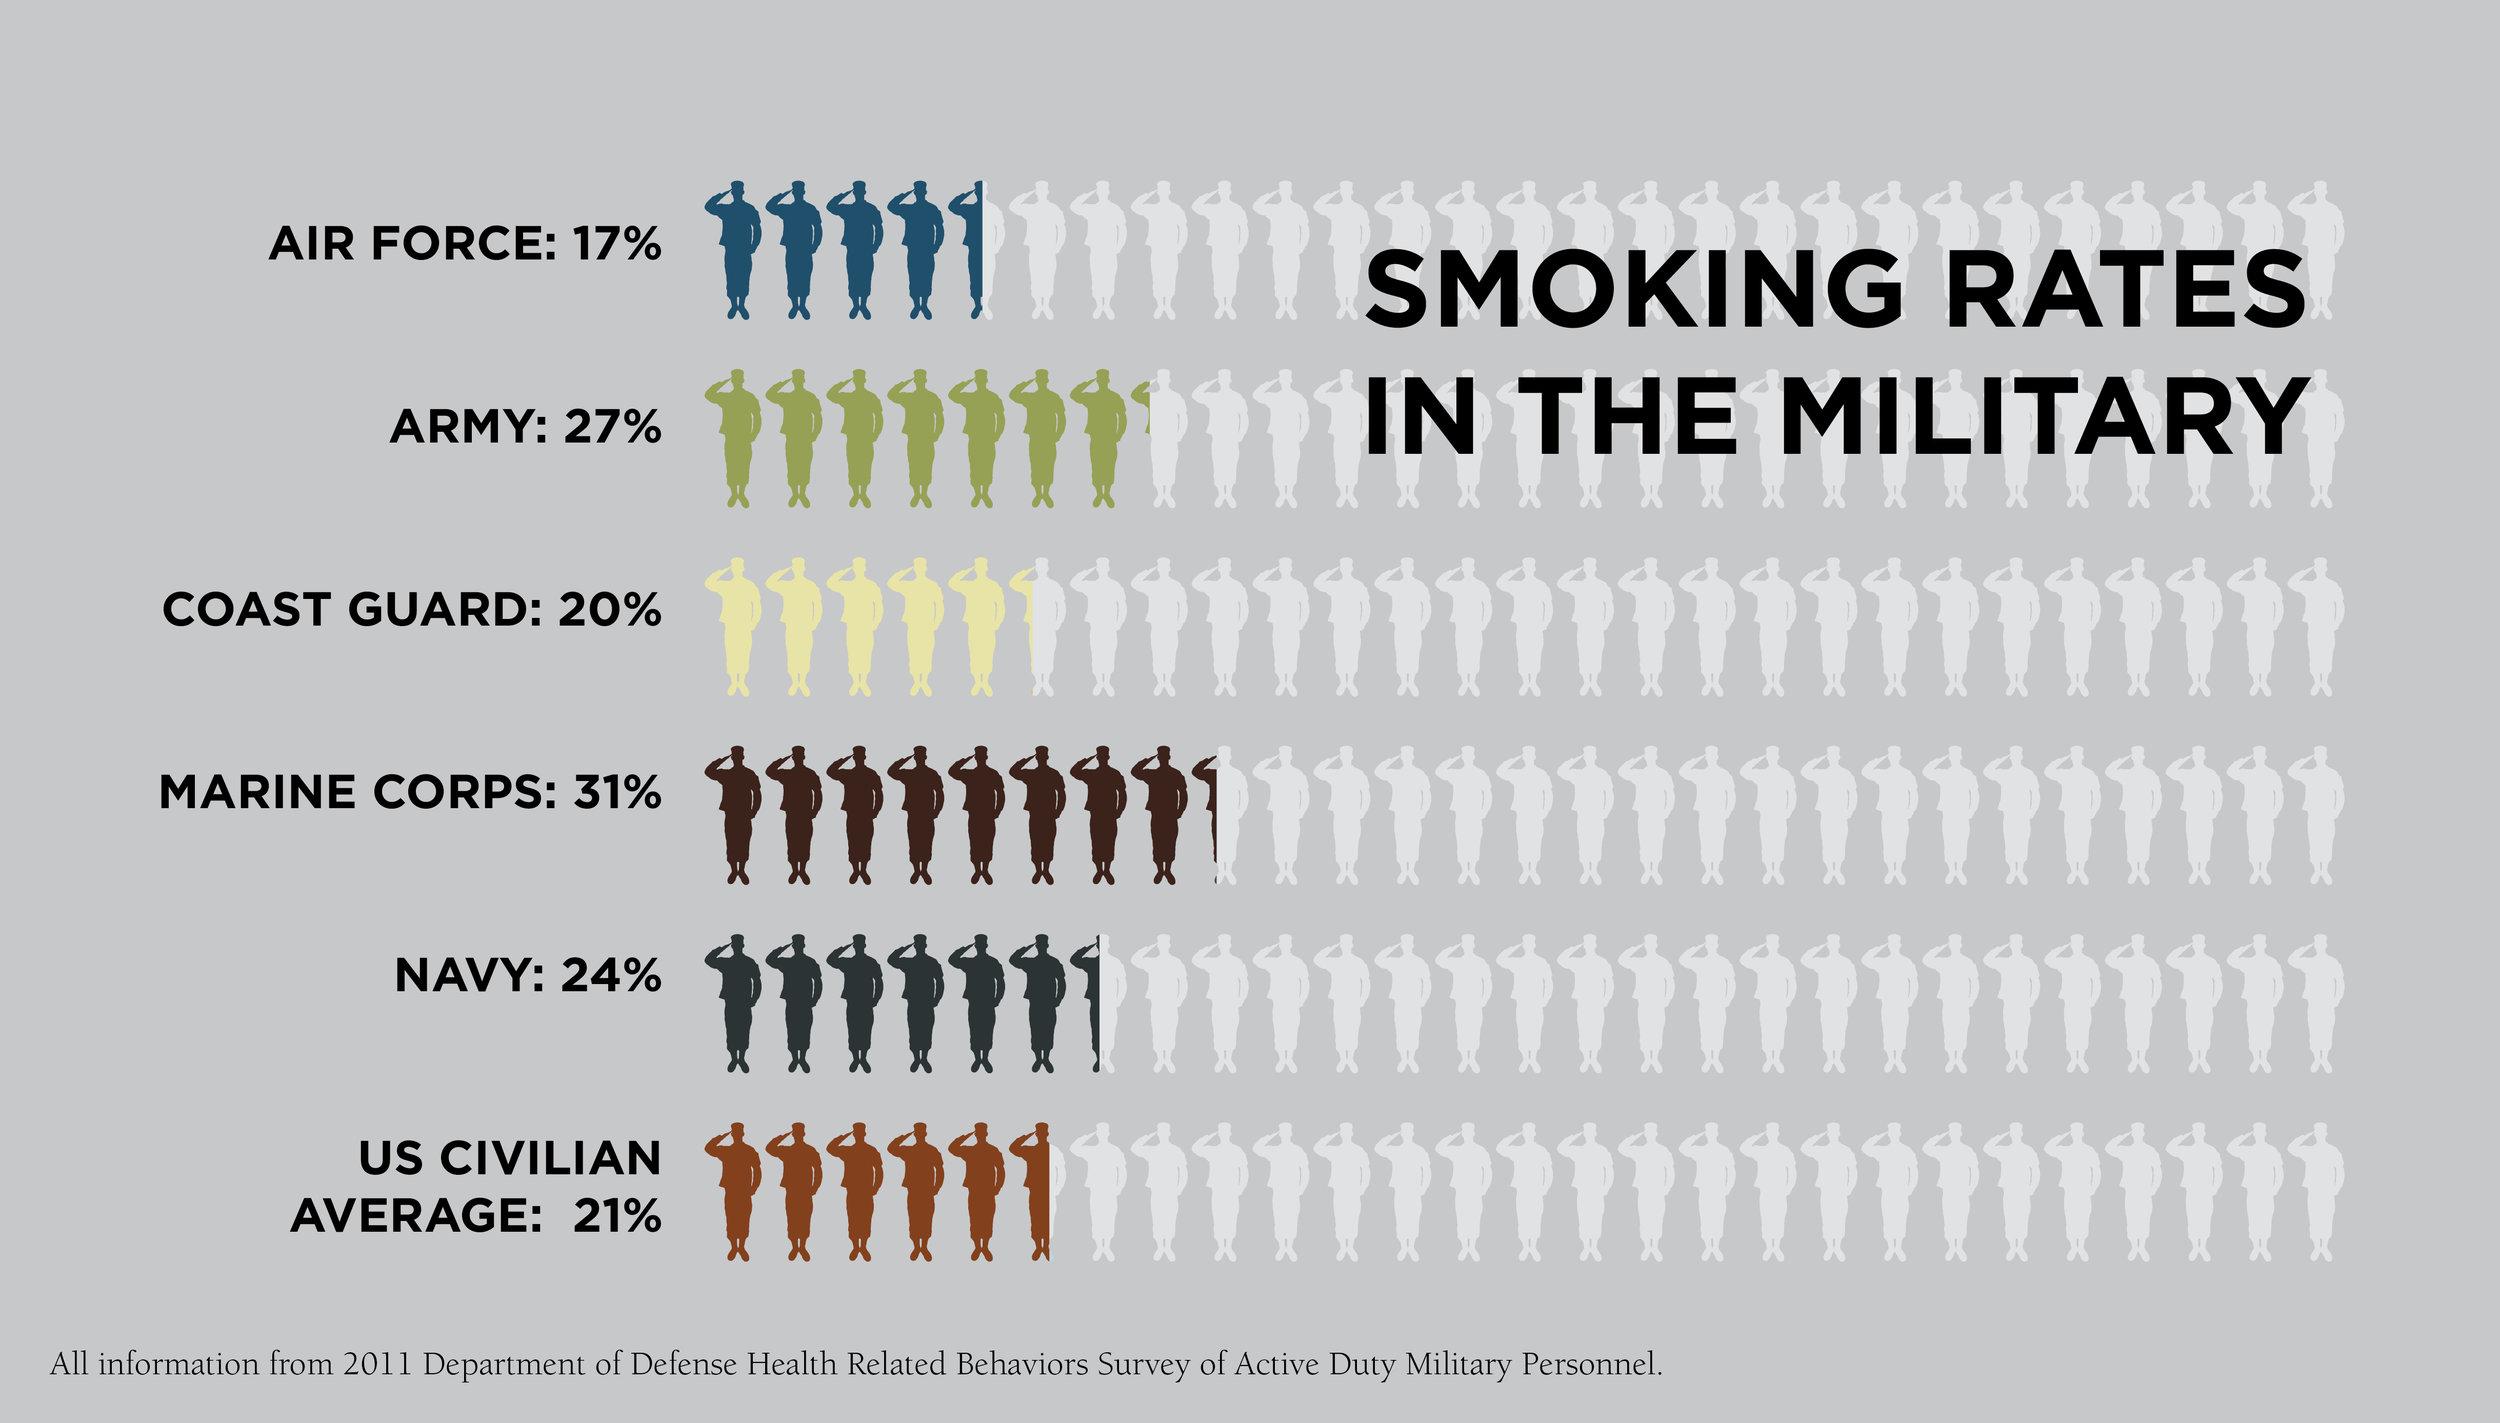 InfographicGallery.jpg